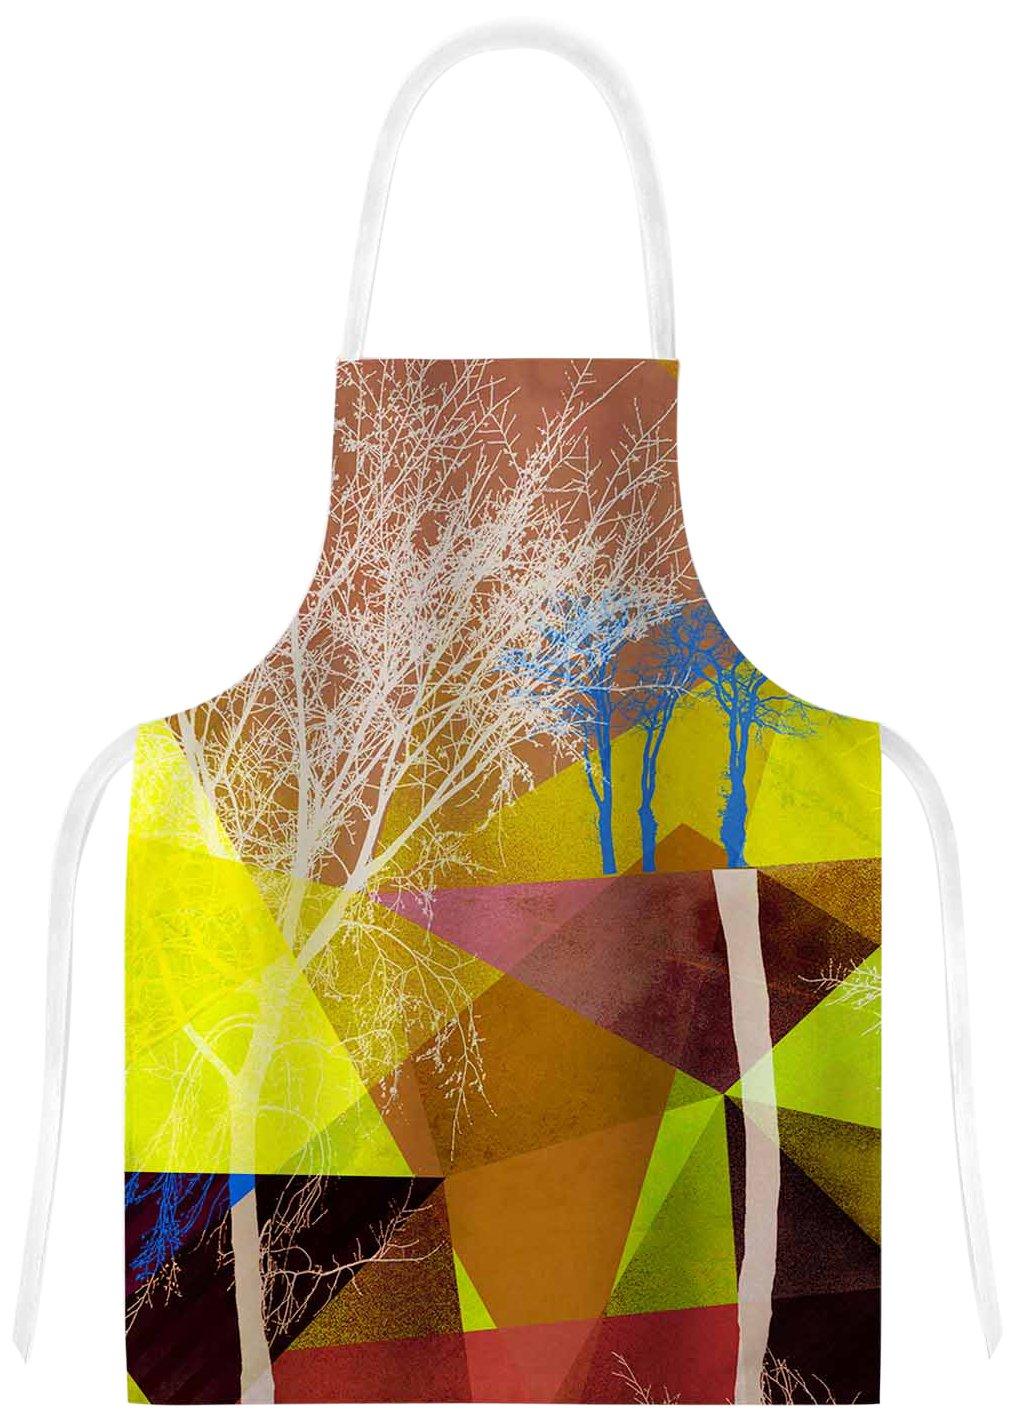 KESS InHouse PS1034AAR01 Pia SchneiderP17 Yellow Blue Artistic Apron Multicolor 31 x 36